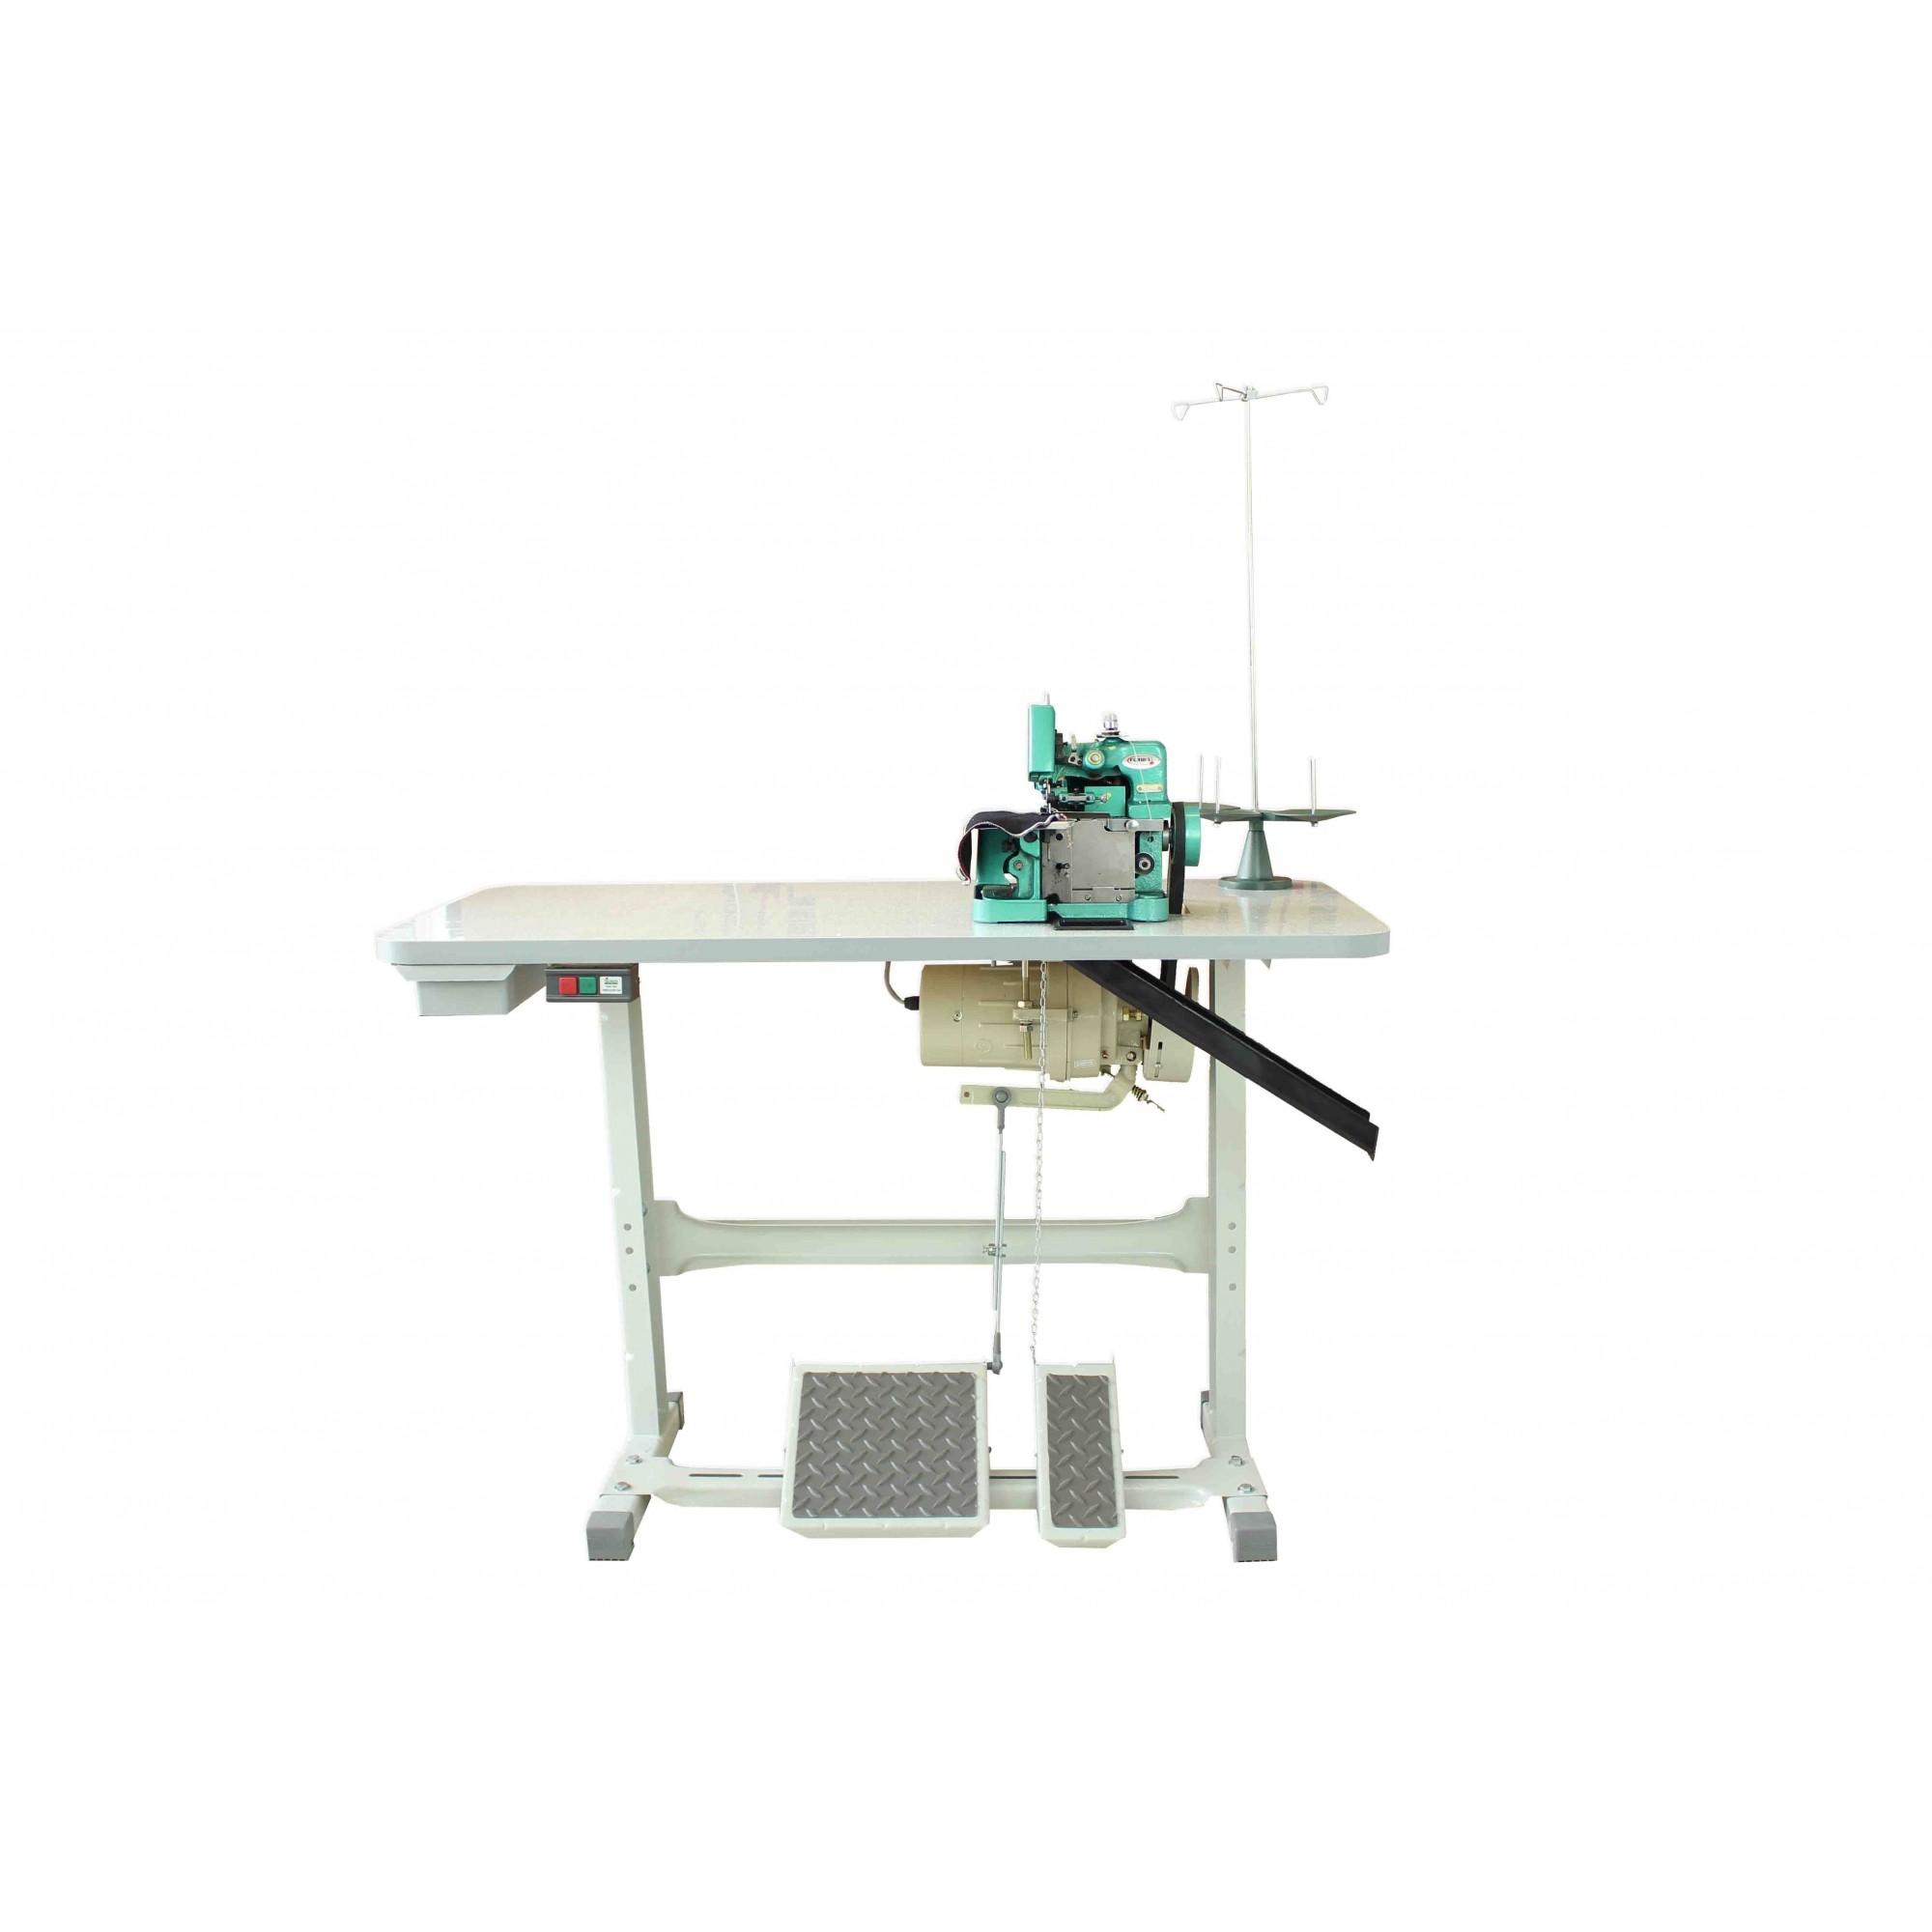 Máquina de costura Overloque Semi Industrial com MOTOR INDUSTRIAL